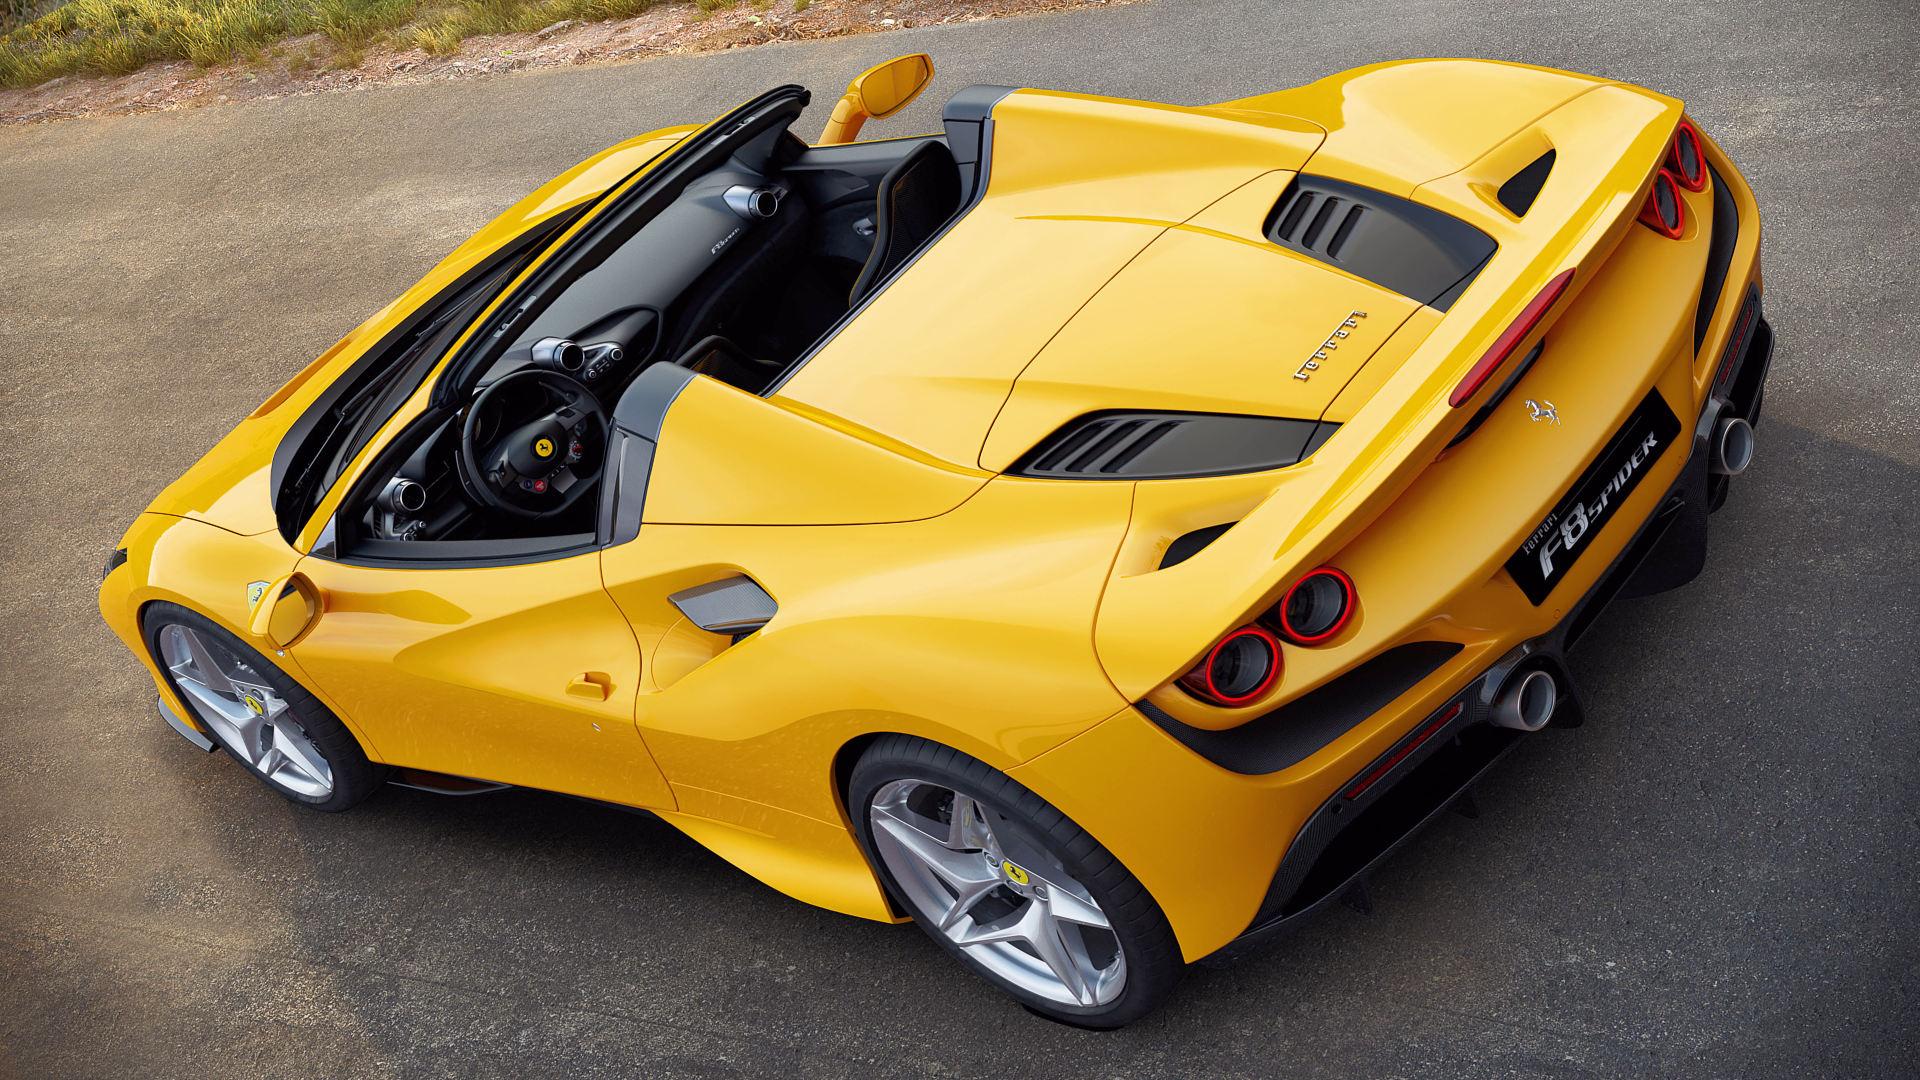 2020 Ferrari F8 Spider Convertible Yellow